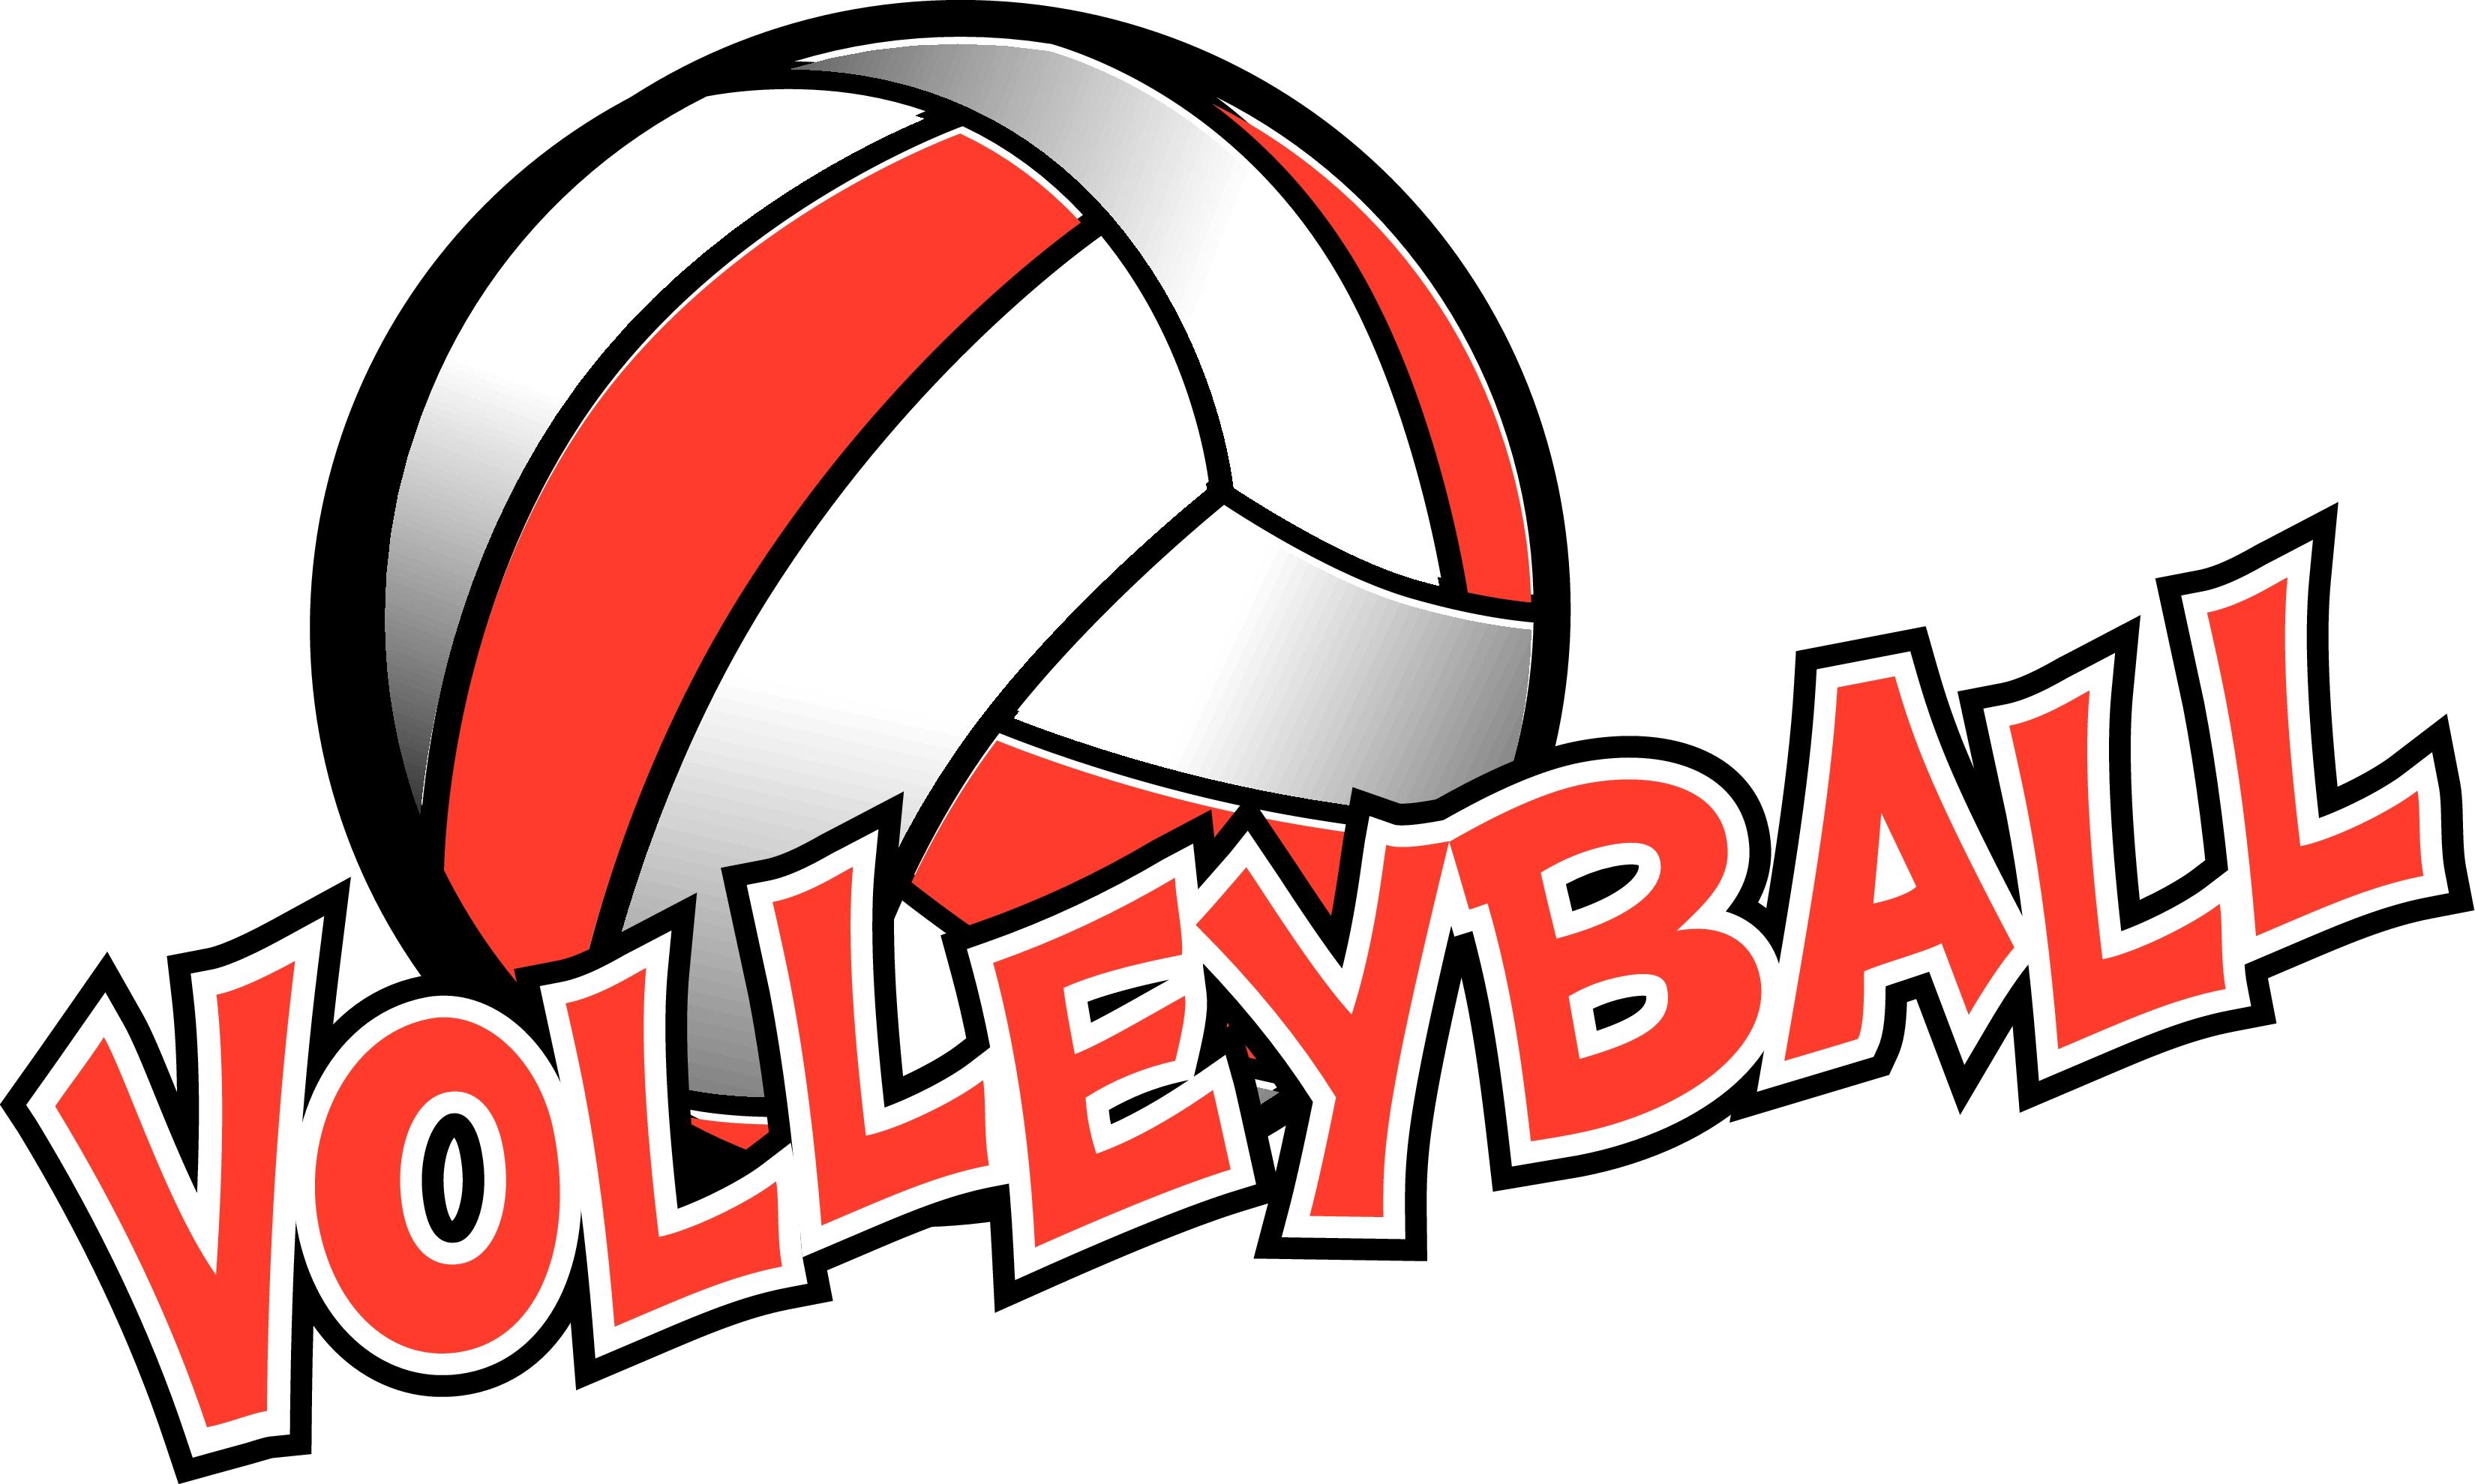 3300x1979 Volleyball Clip Art